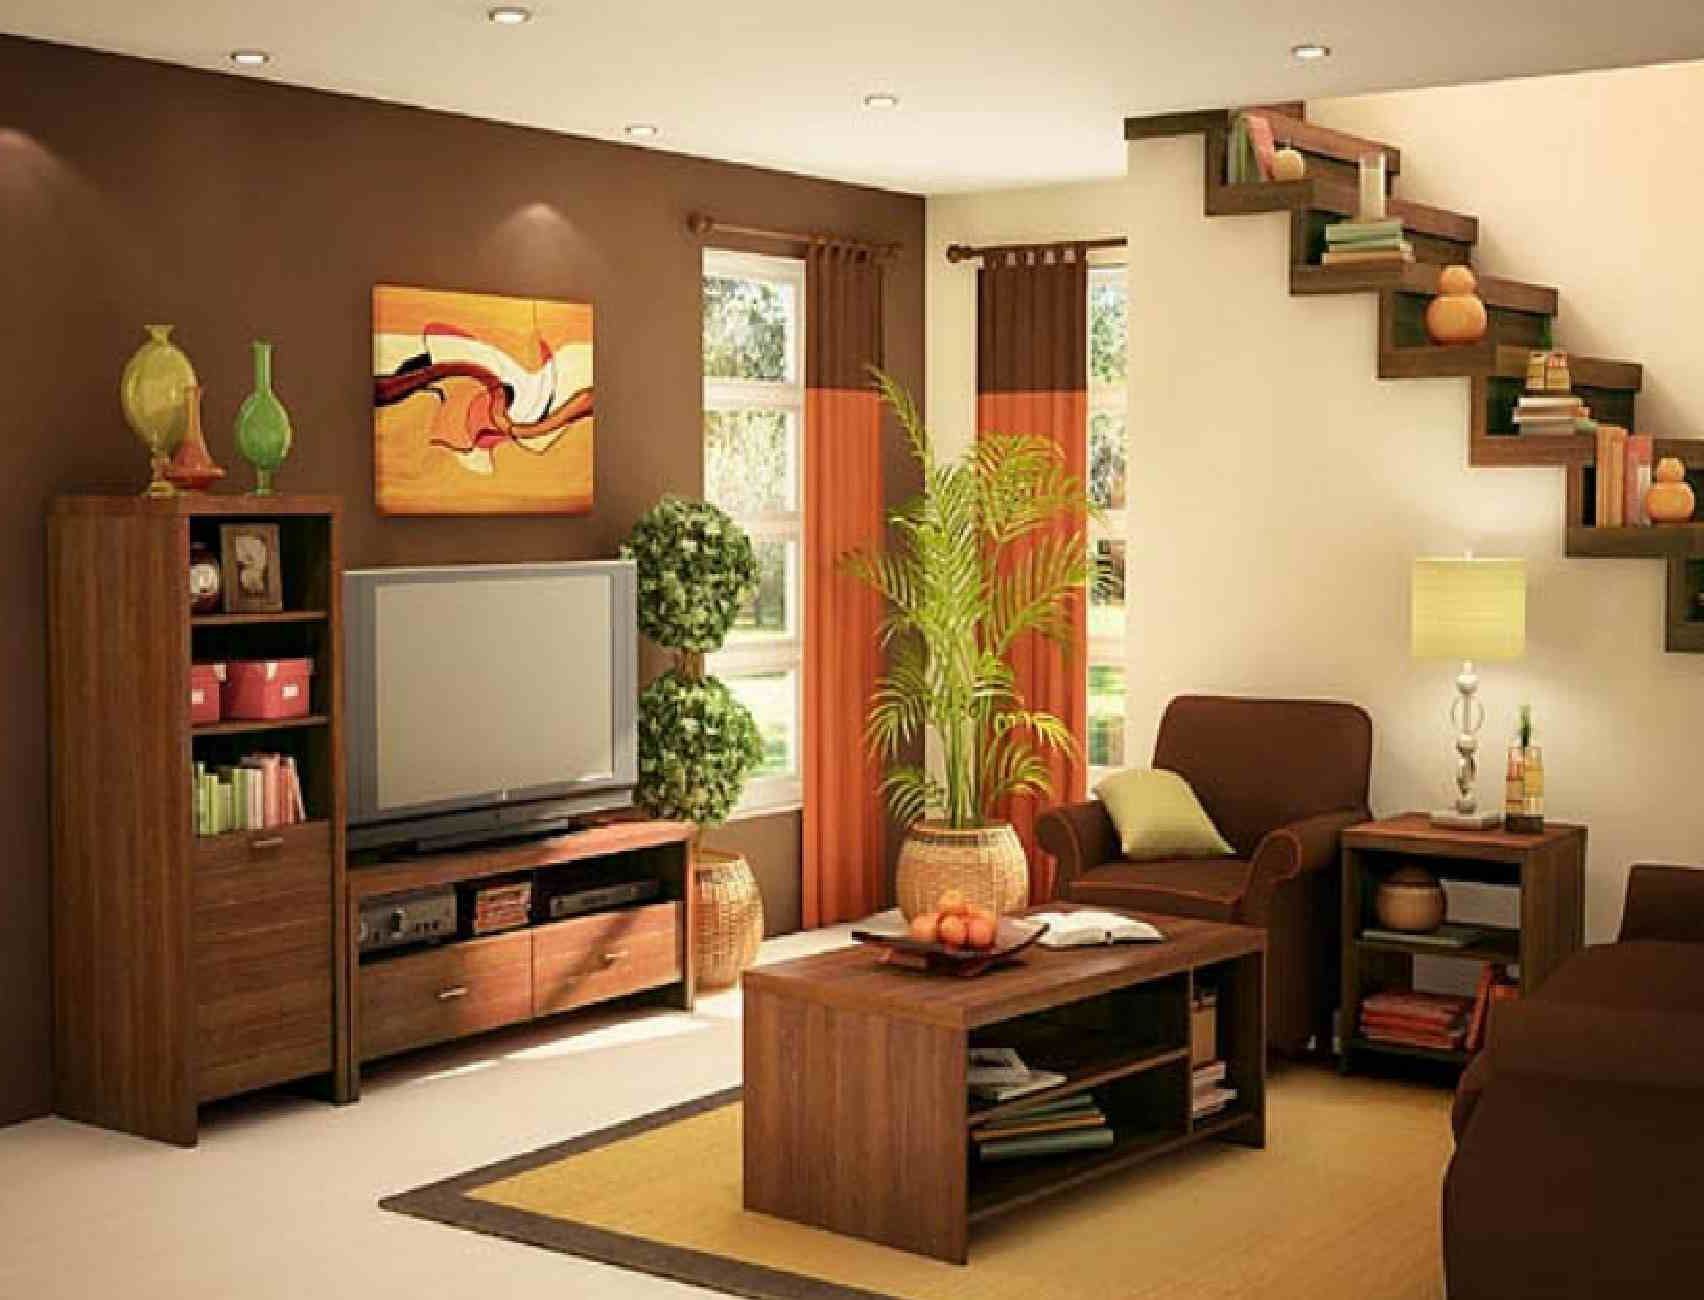 Minimalist Small Living Room Design Philippines - WOWHOMY